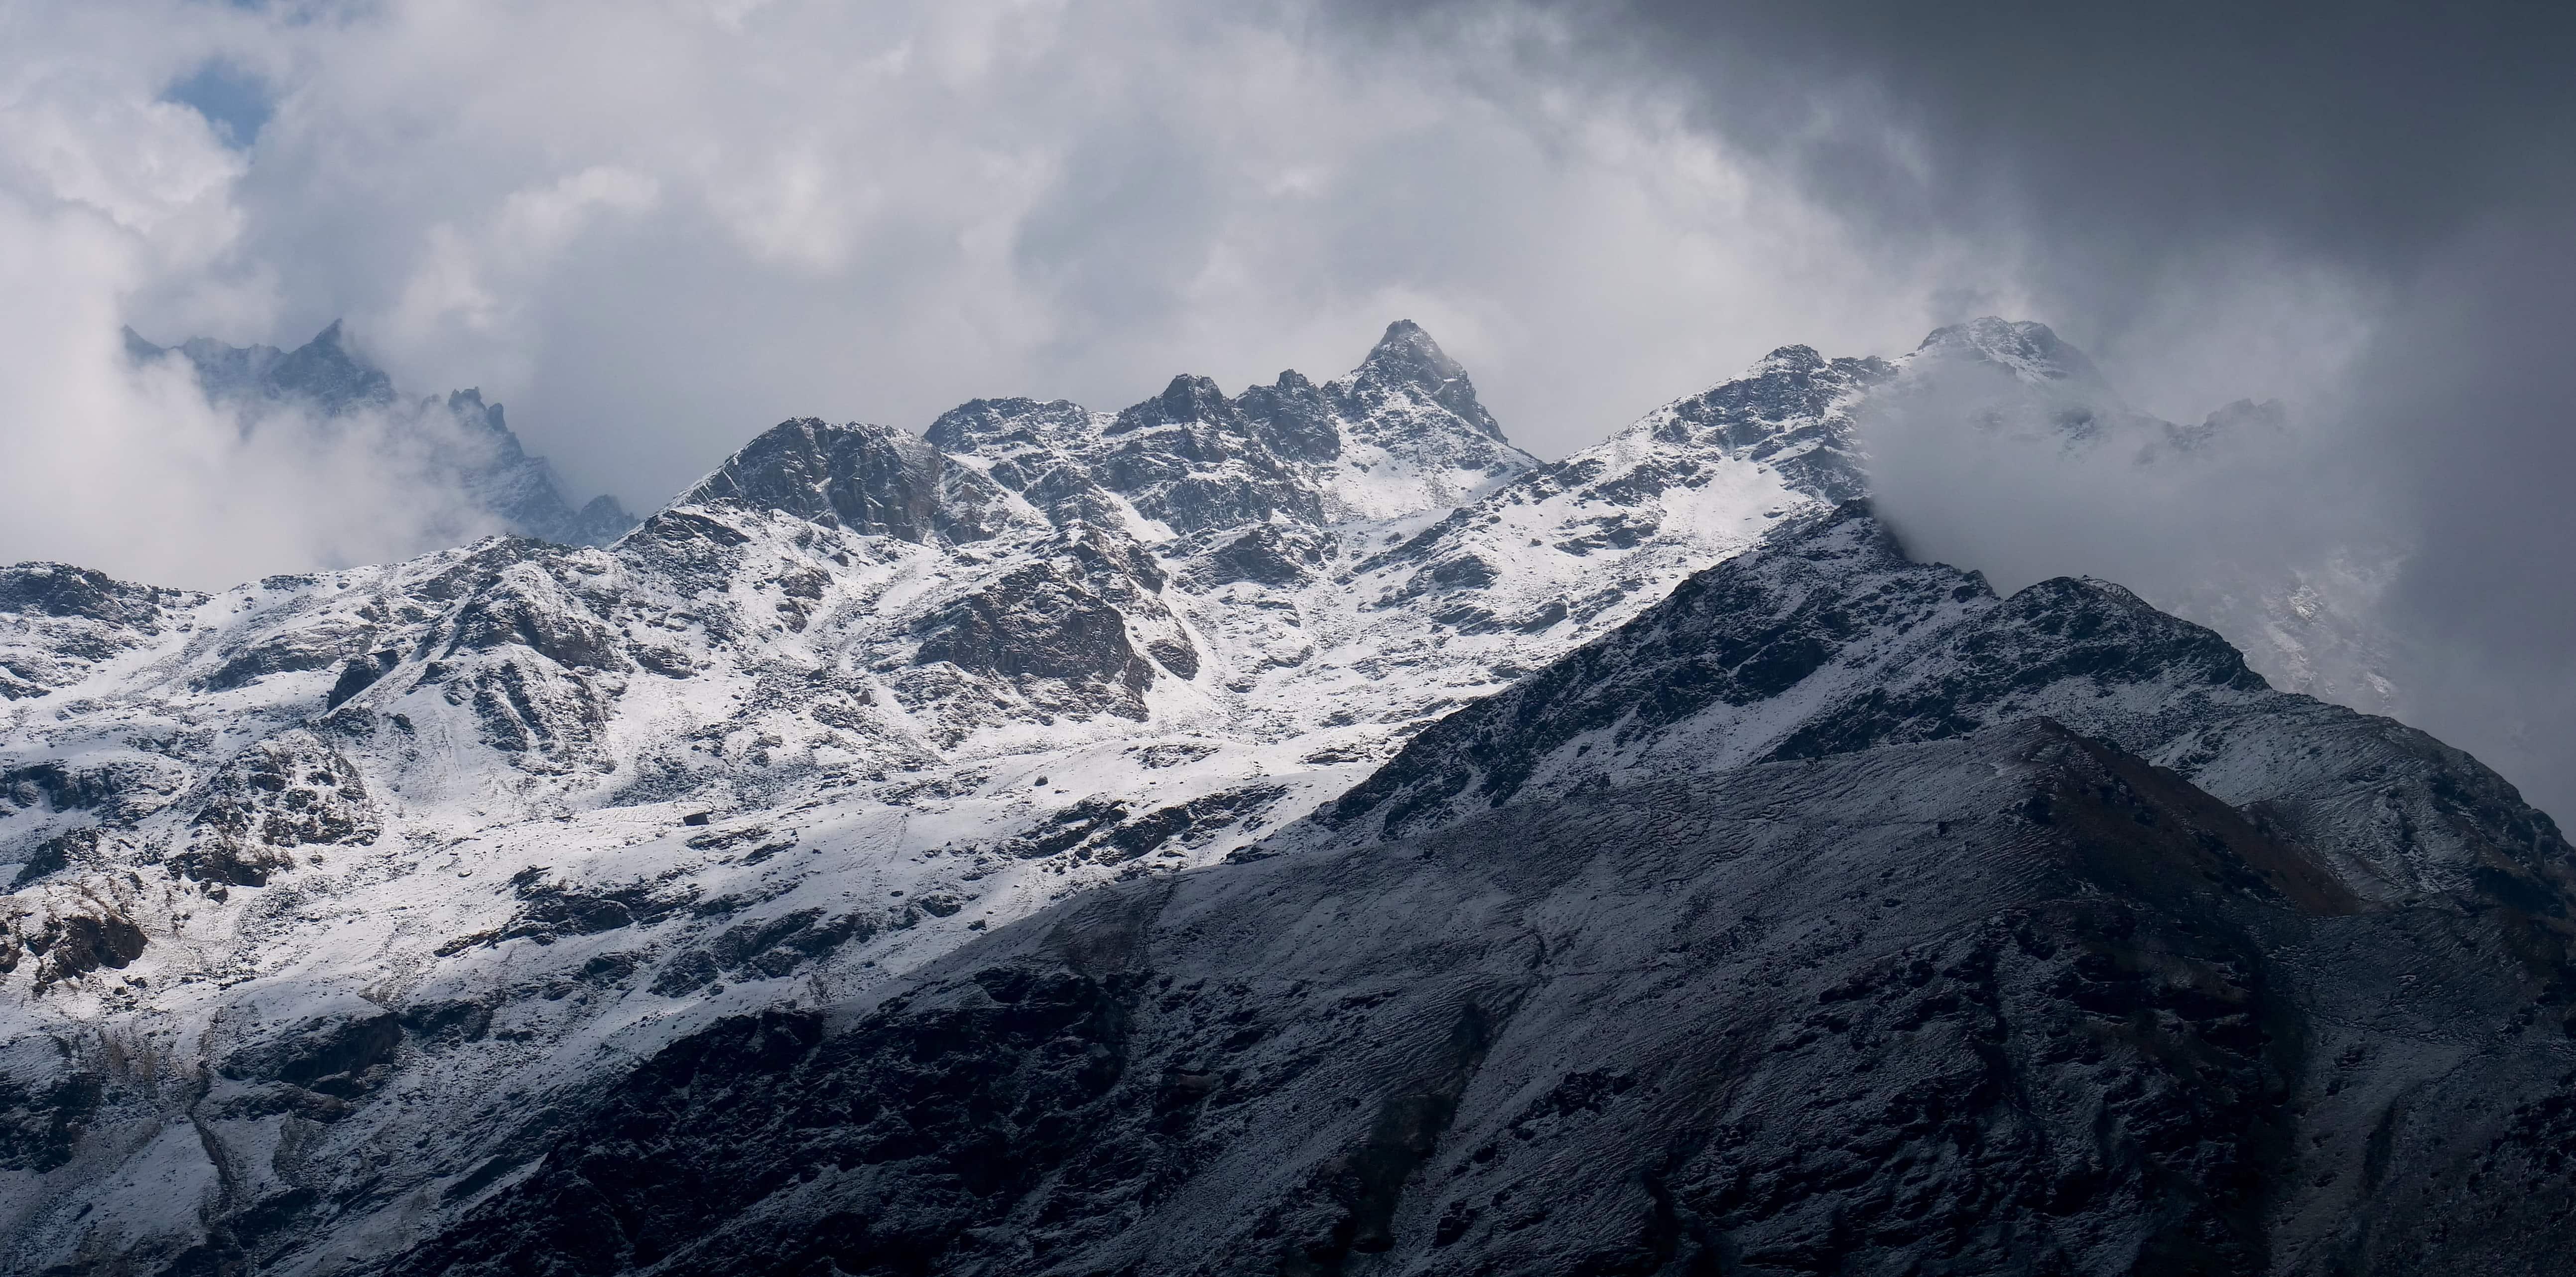 Field Recording nepal himalaya David kamp studiokamp mountain ridge header